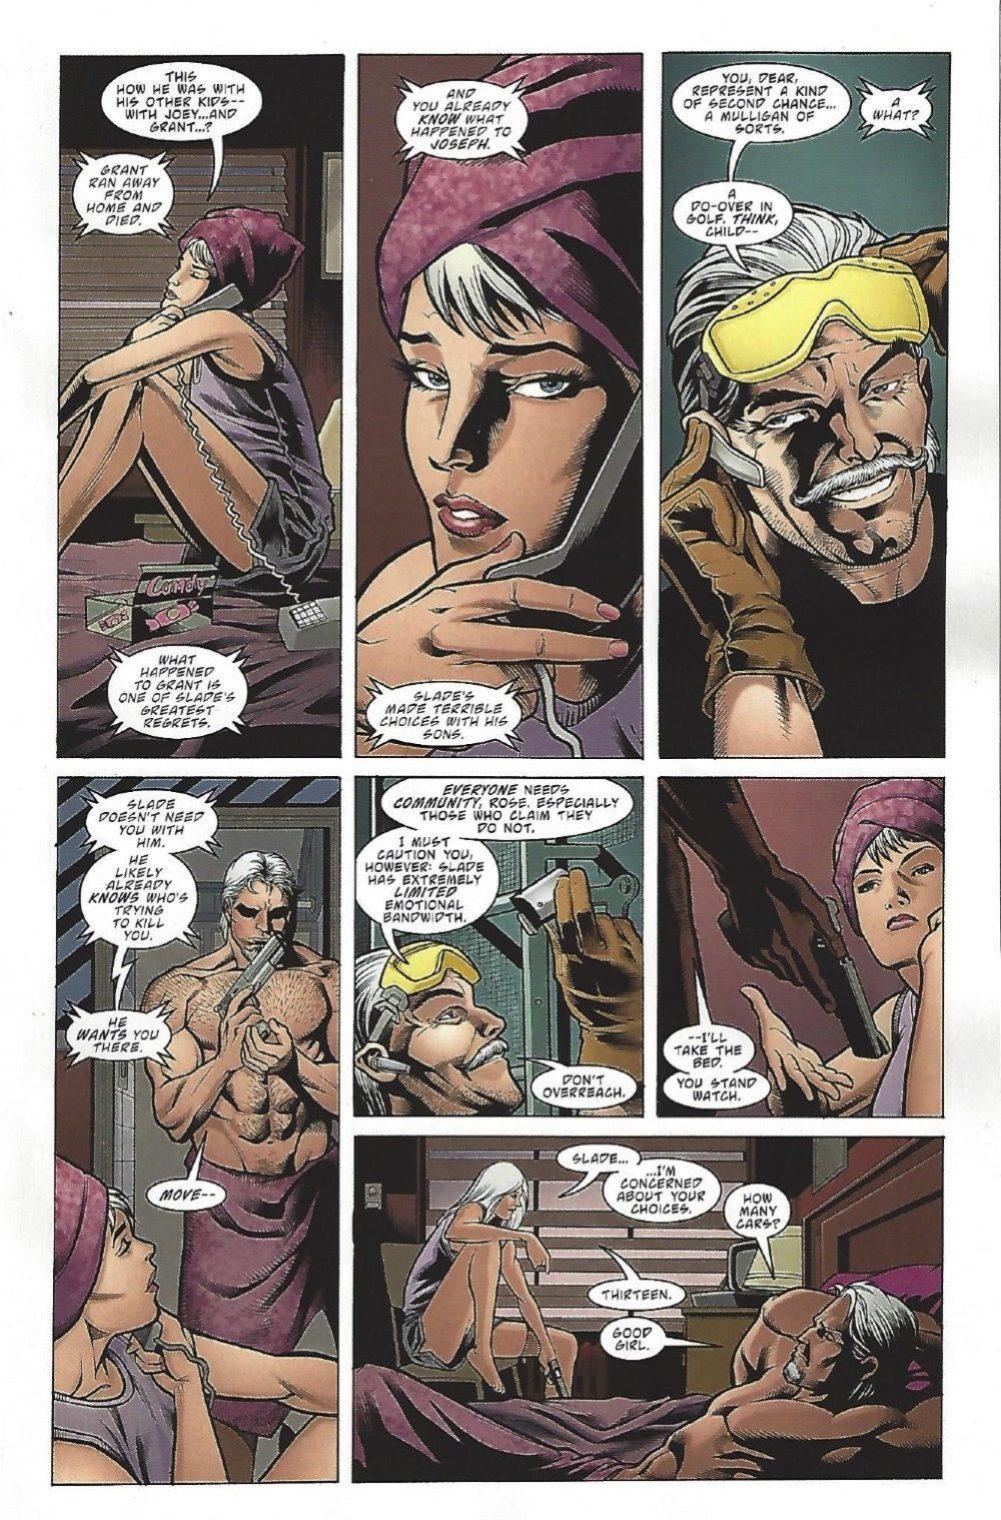 Look, it's mirror image Alfred, aka Wintergreen. image copyright DC Comics